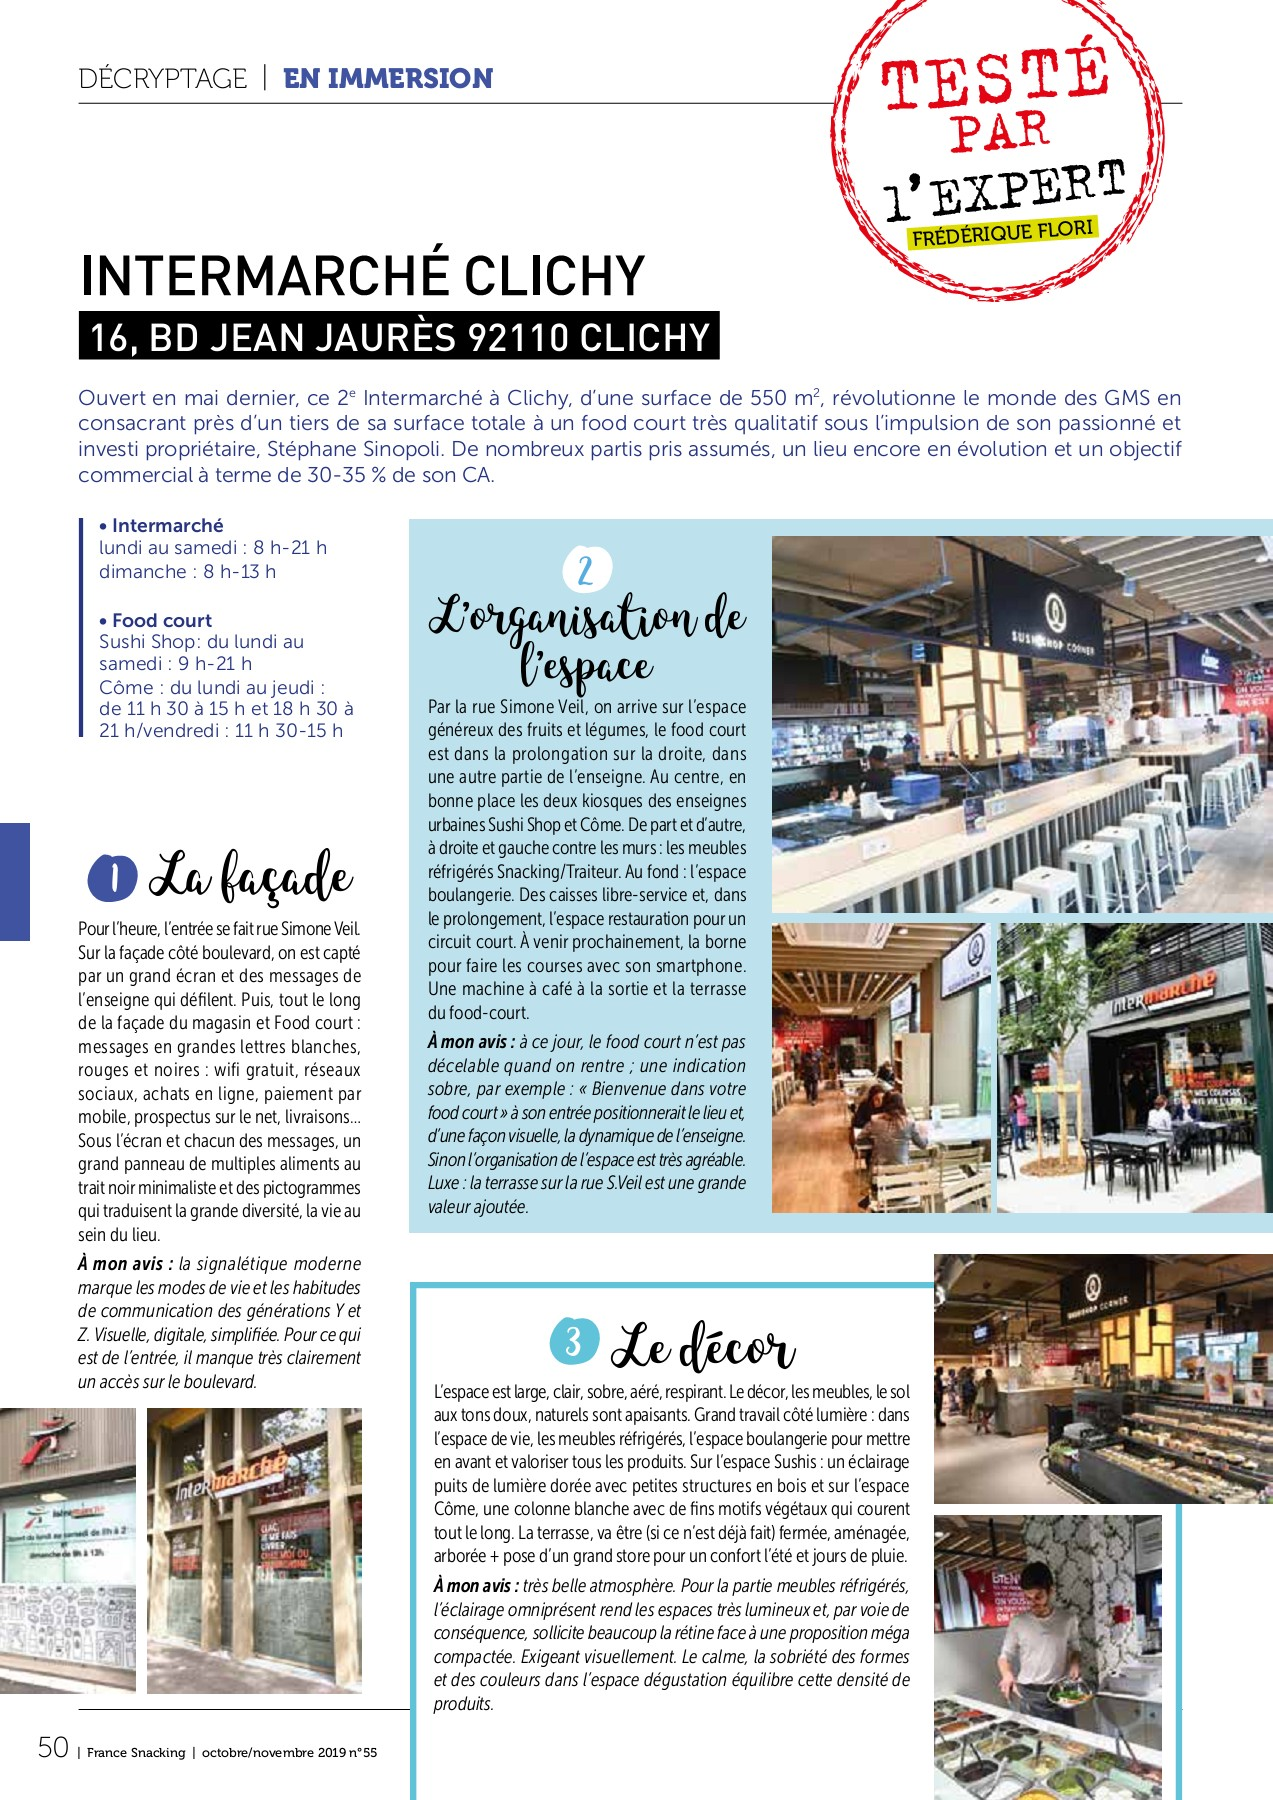 Salon Jardin Intermarche Frais France Snacking N°55 Pages 51 100 Text Version